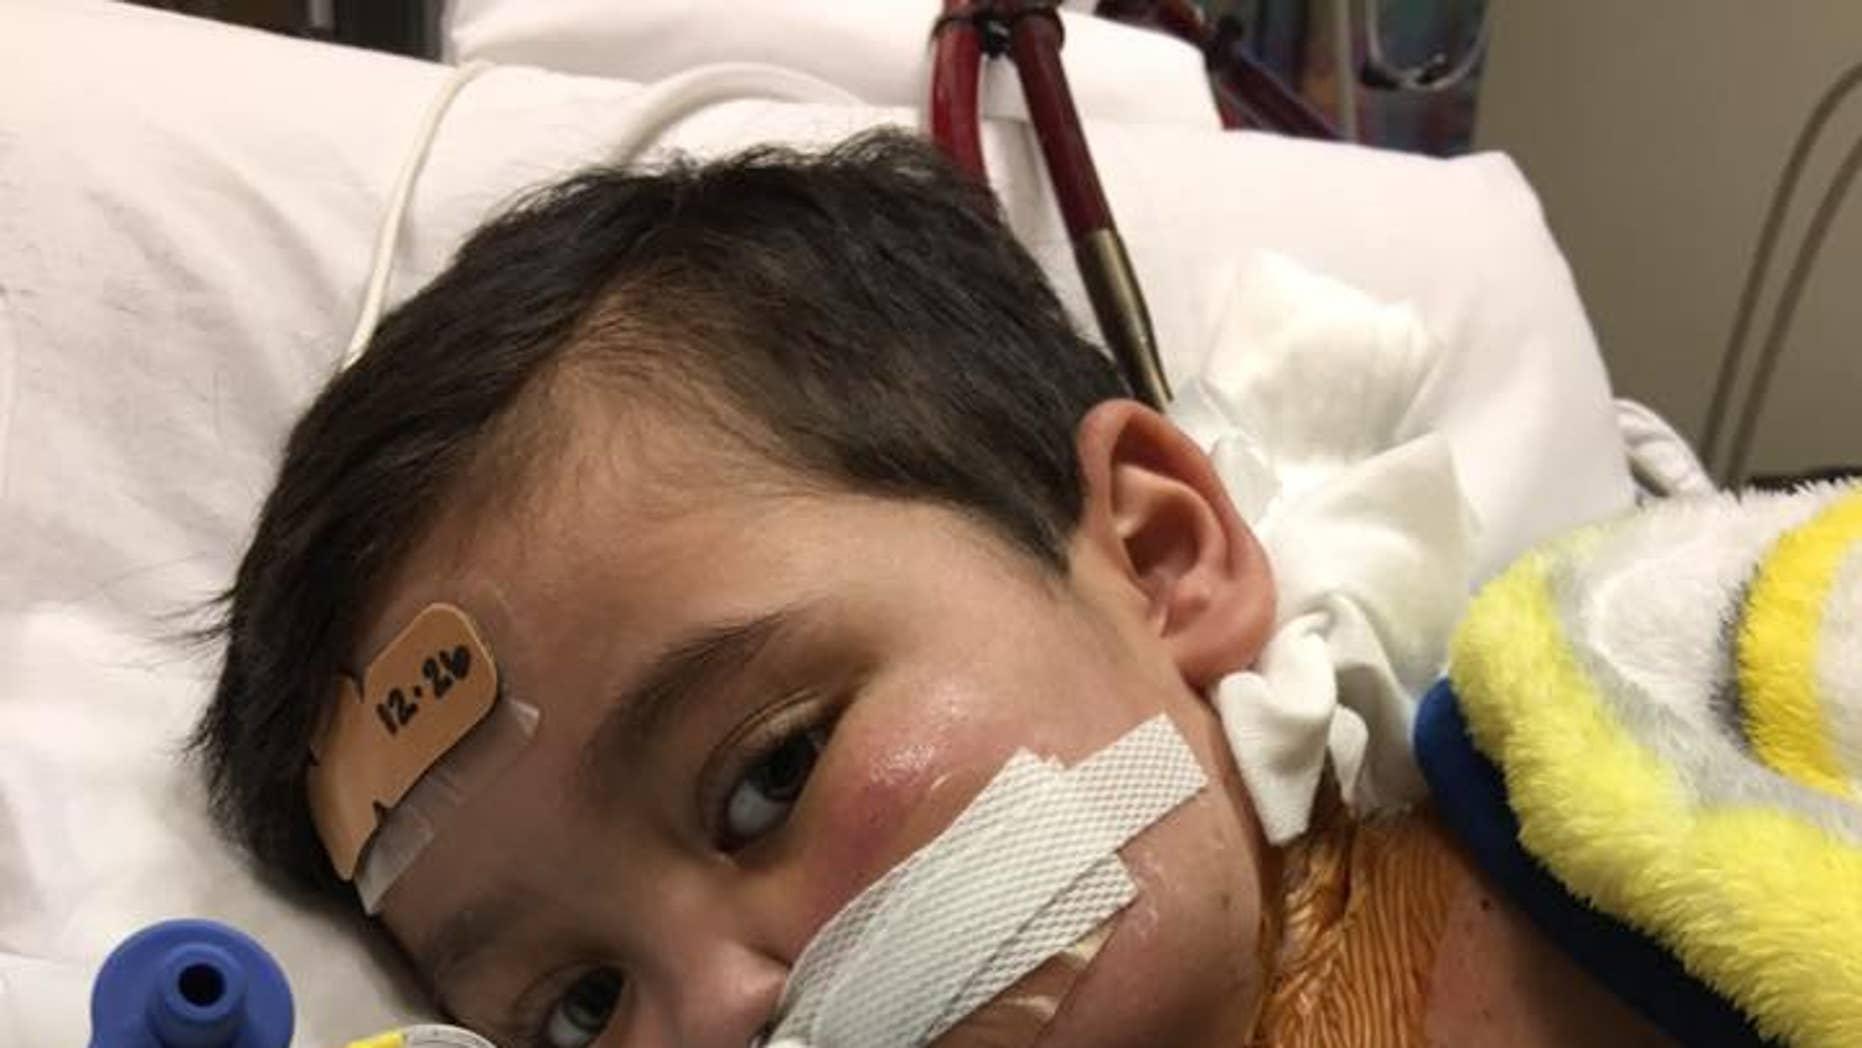 Kolton Hessman is waiting for a heart transplant.